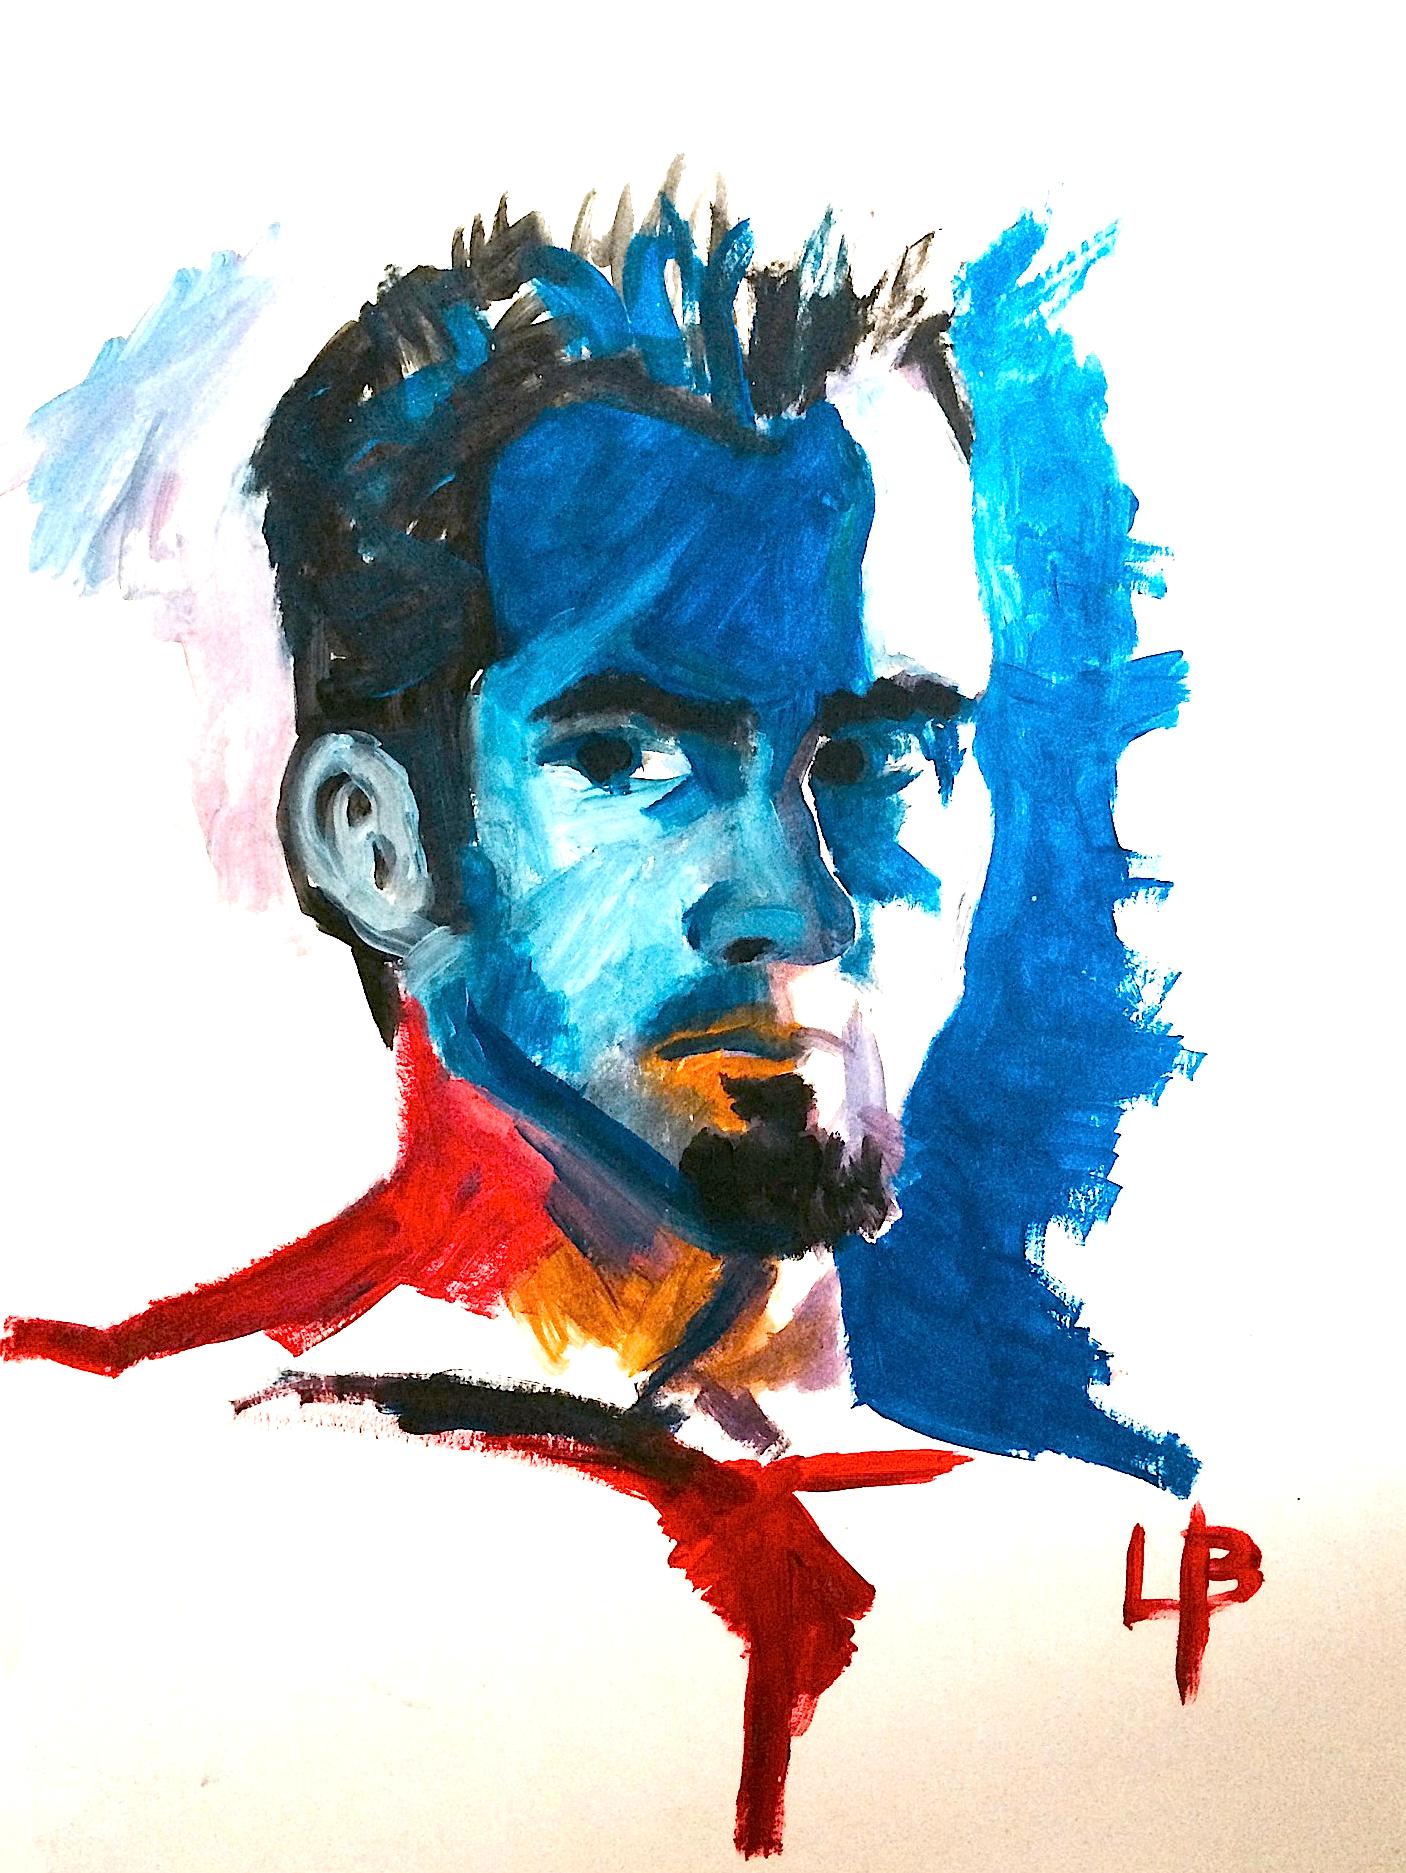 LB-self-portrait.JPG